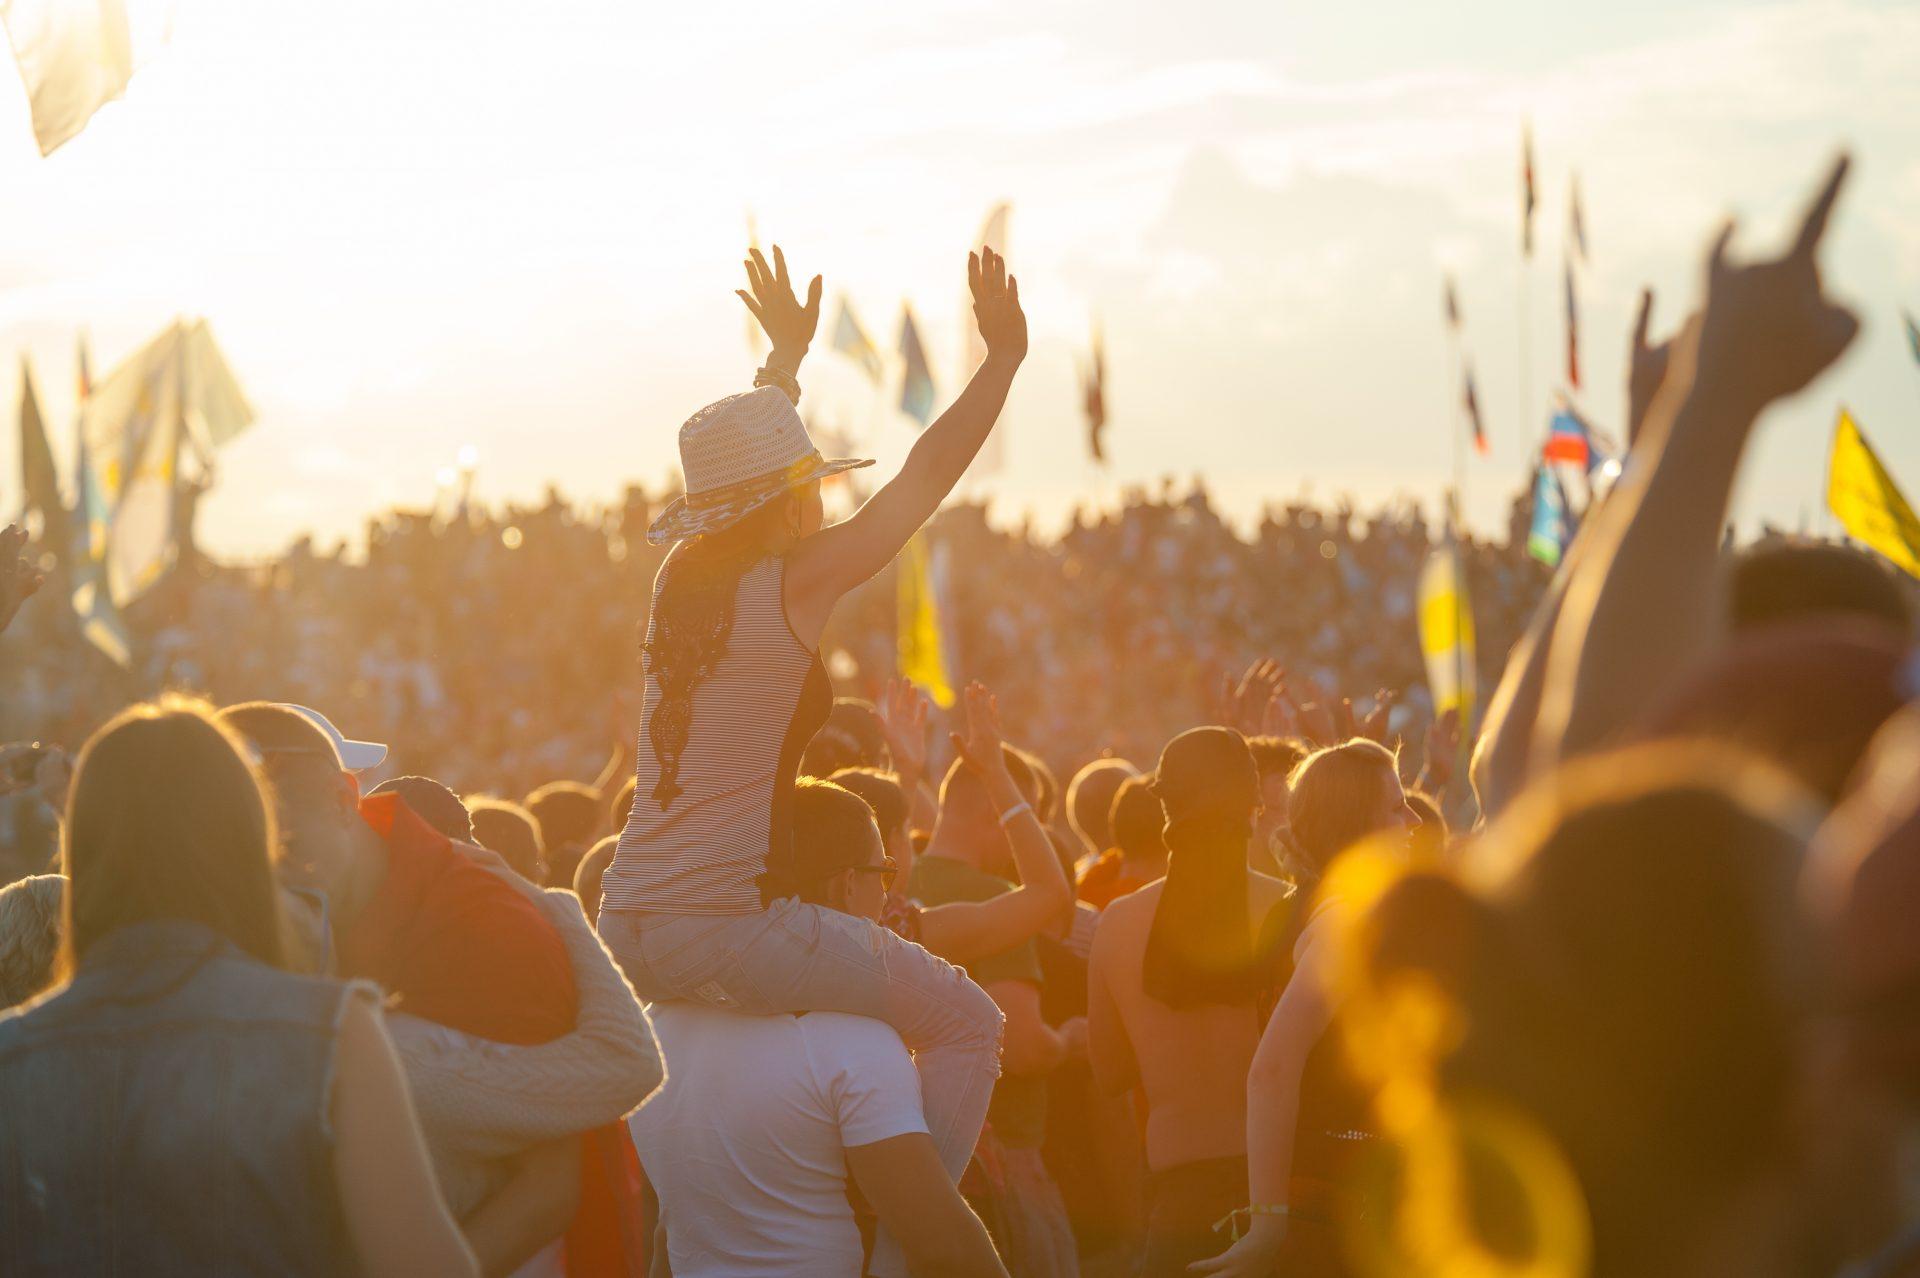 AdobeStock 67486433 The Top 5 Music Festivals Every Female Traveler Should Attend